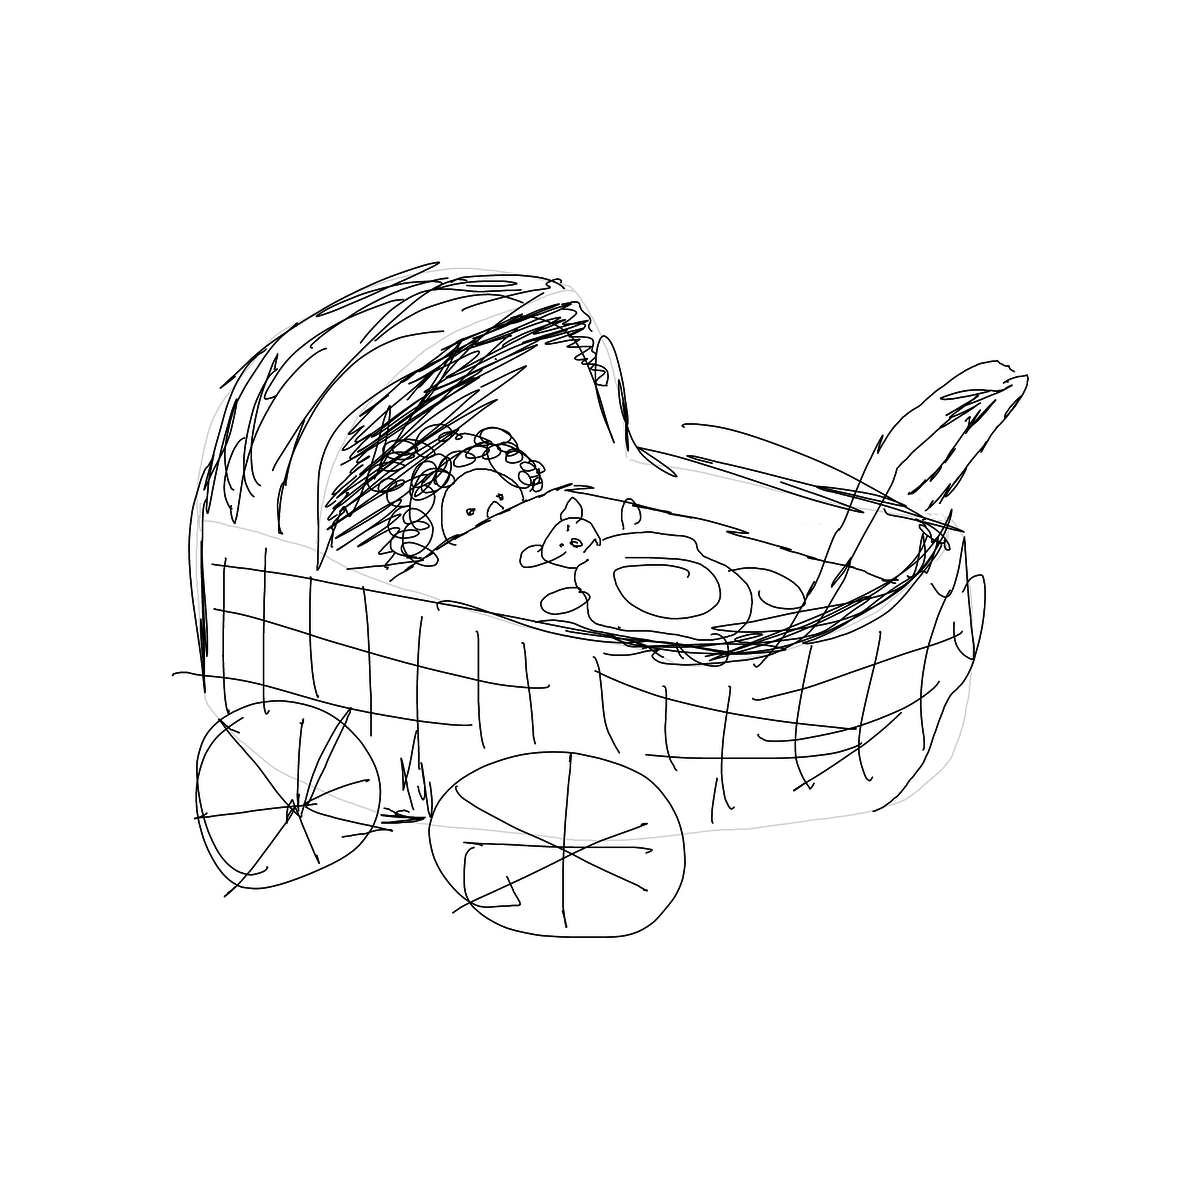 BAAAM drawing#8429 lat:52.0855522155761700lng: 4.3359913825988770